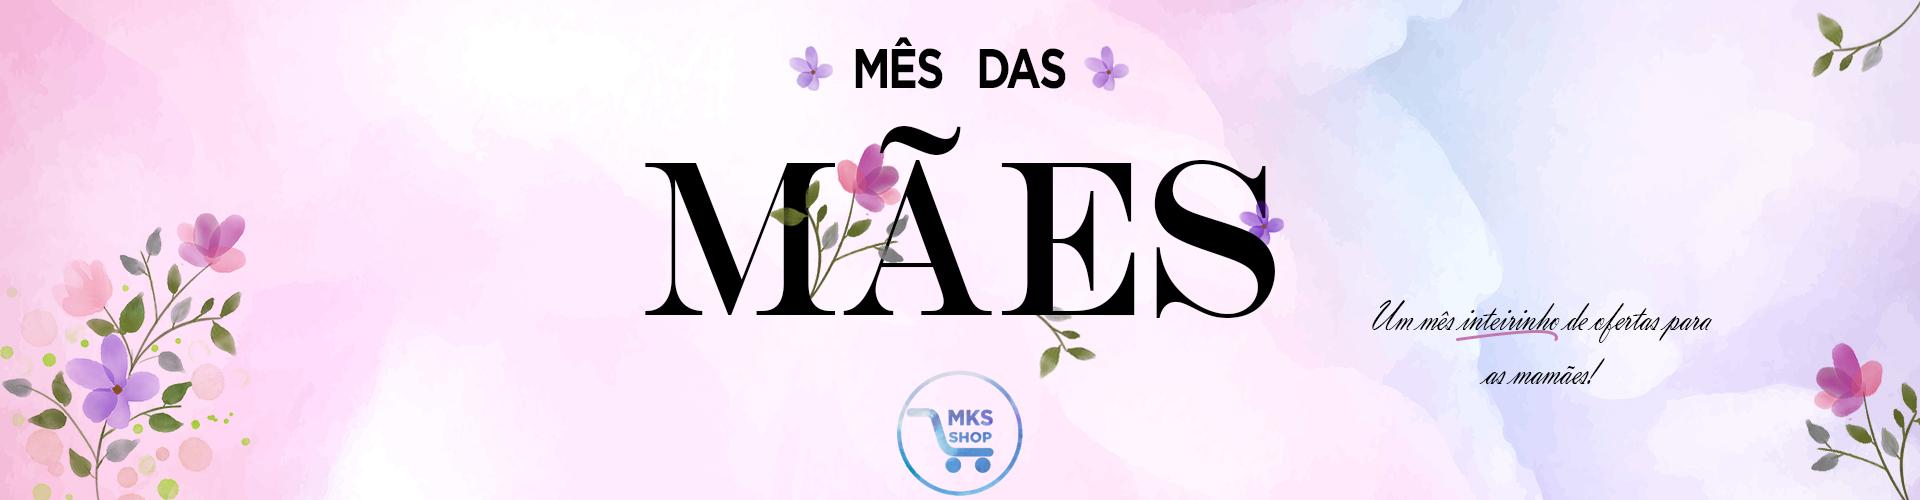 Mês das mães na Mks shop